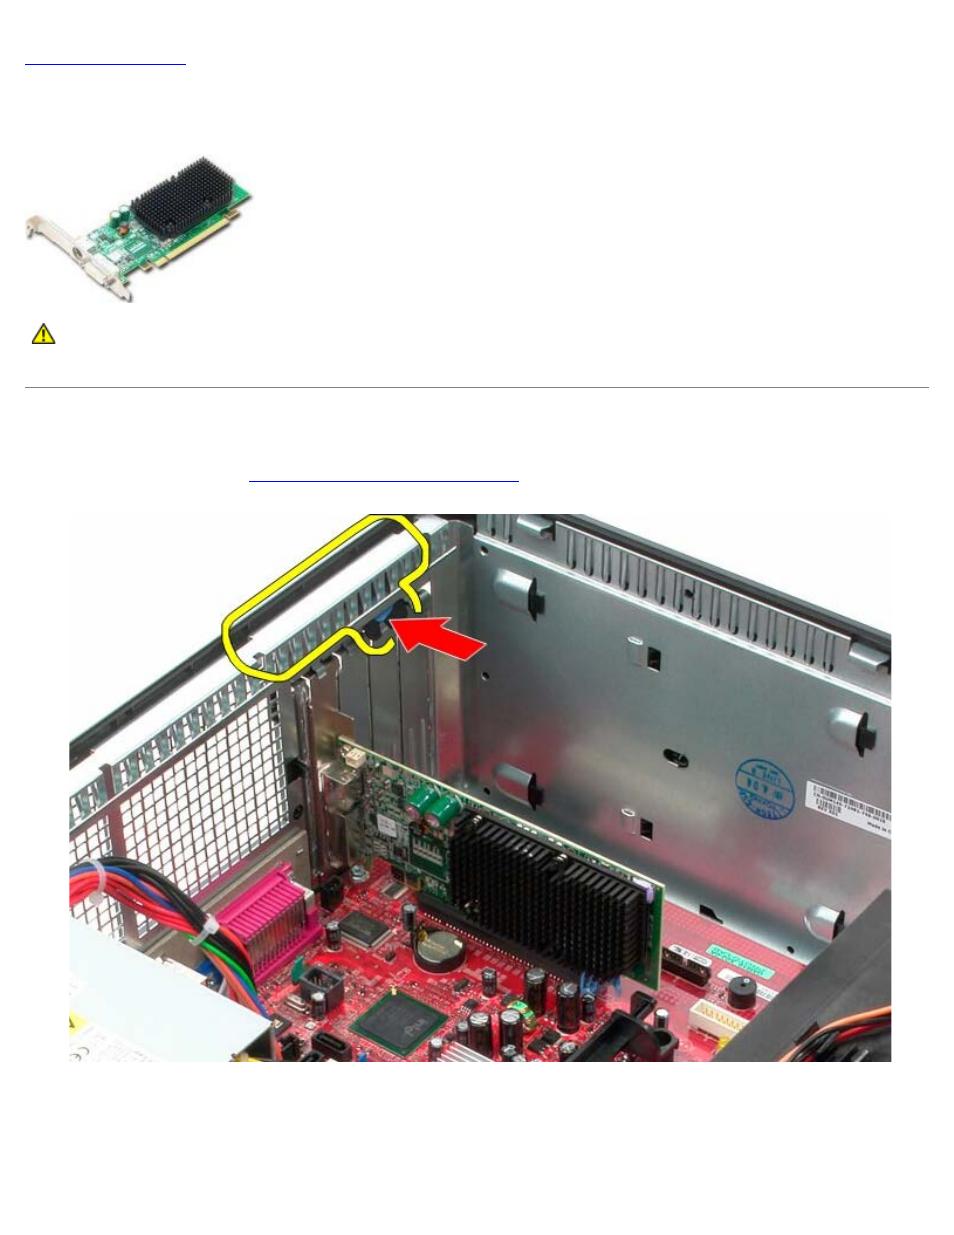 Dell Optiplex Video Card